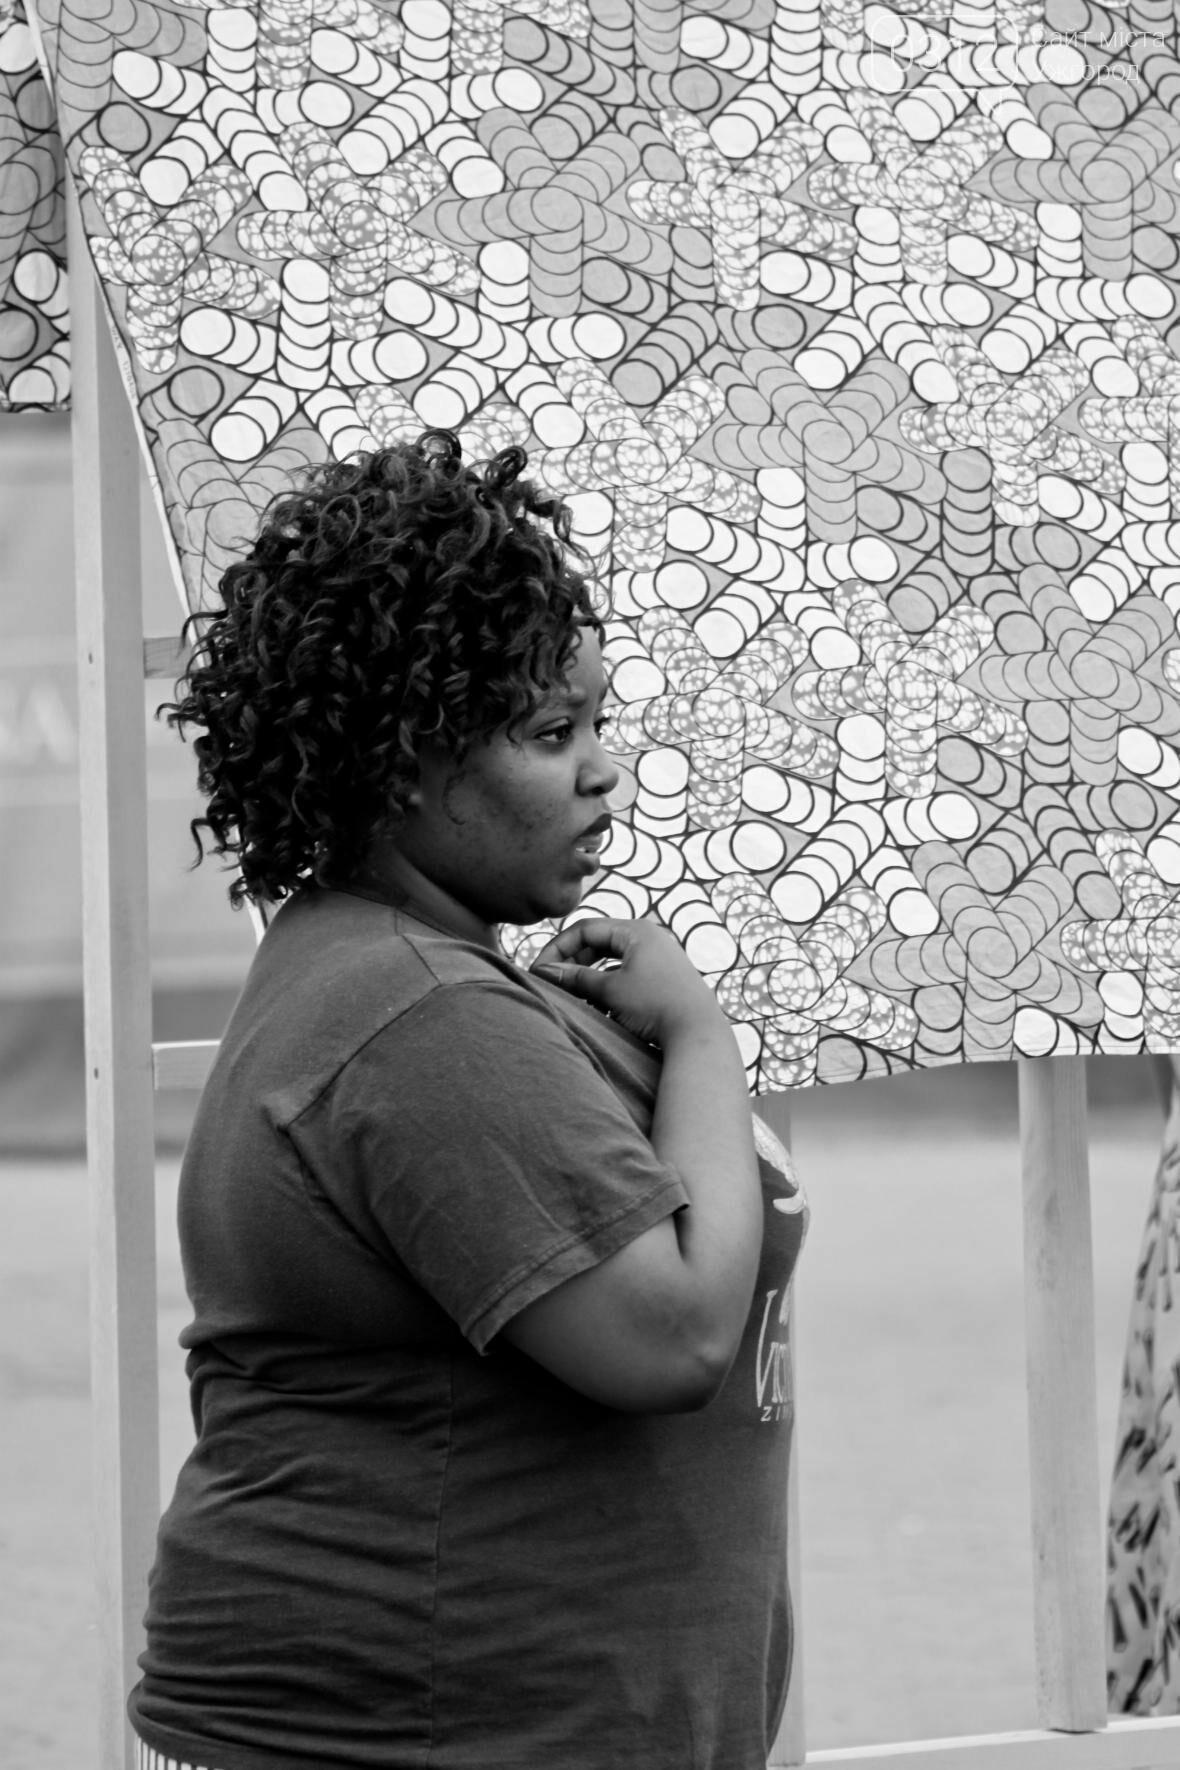 Ужгород говорив мовою сердець: на Театральній пройшло мультикультурне свято (ФОТОРЕПОРТАЖ), фото-29